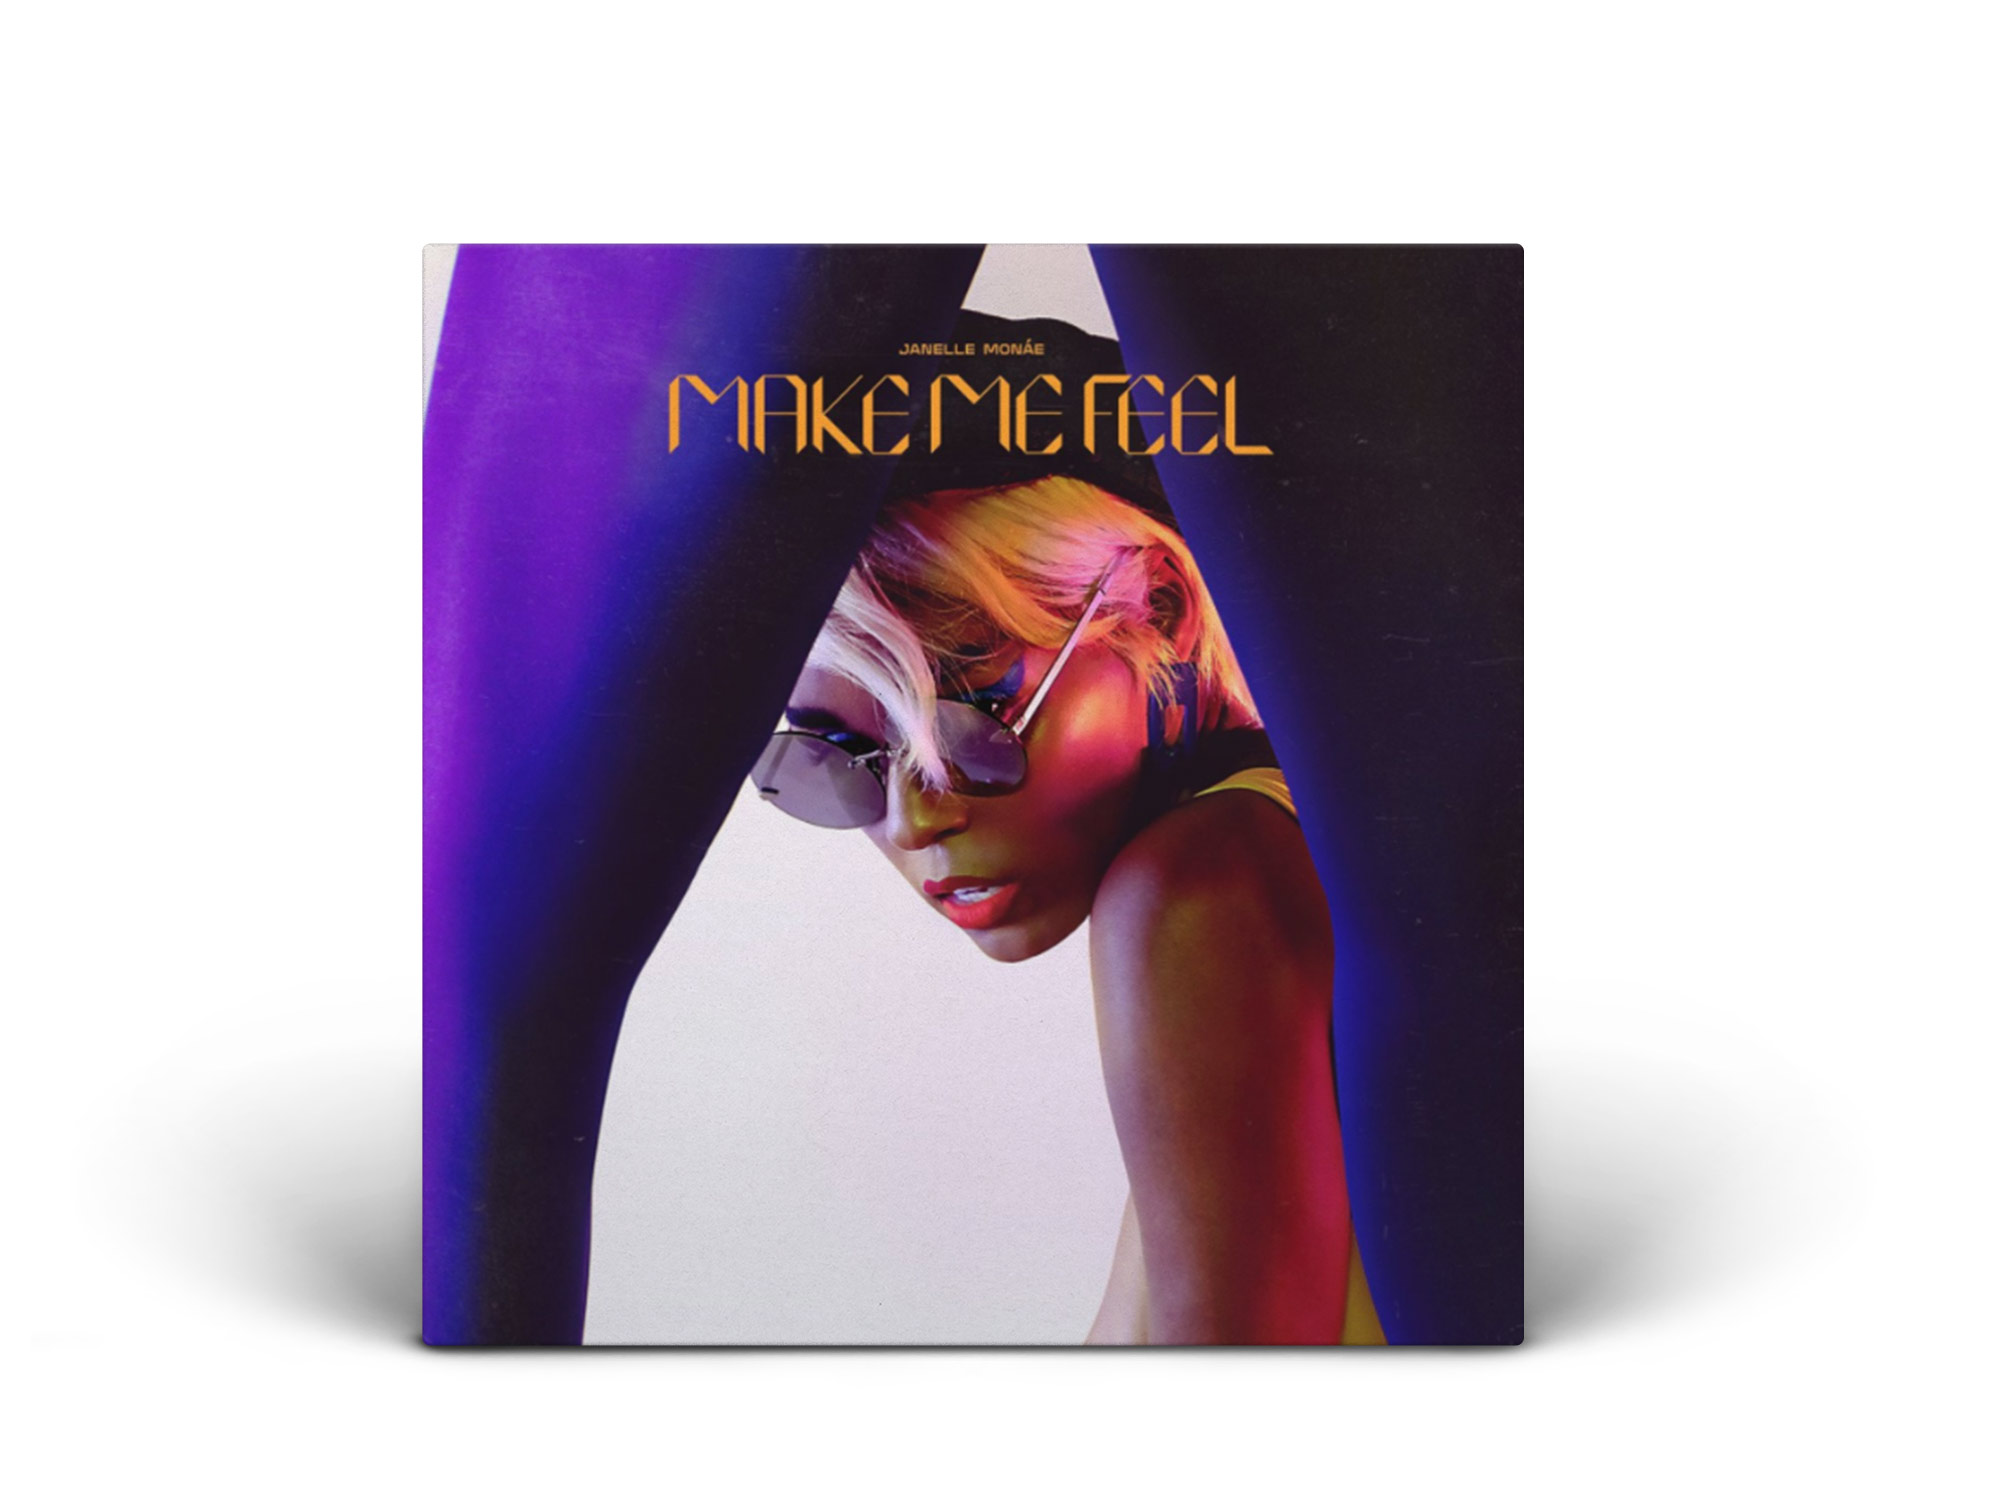 Make Me Feel / Janelle Monáe - Best unstoppable force of self-love.